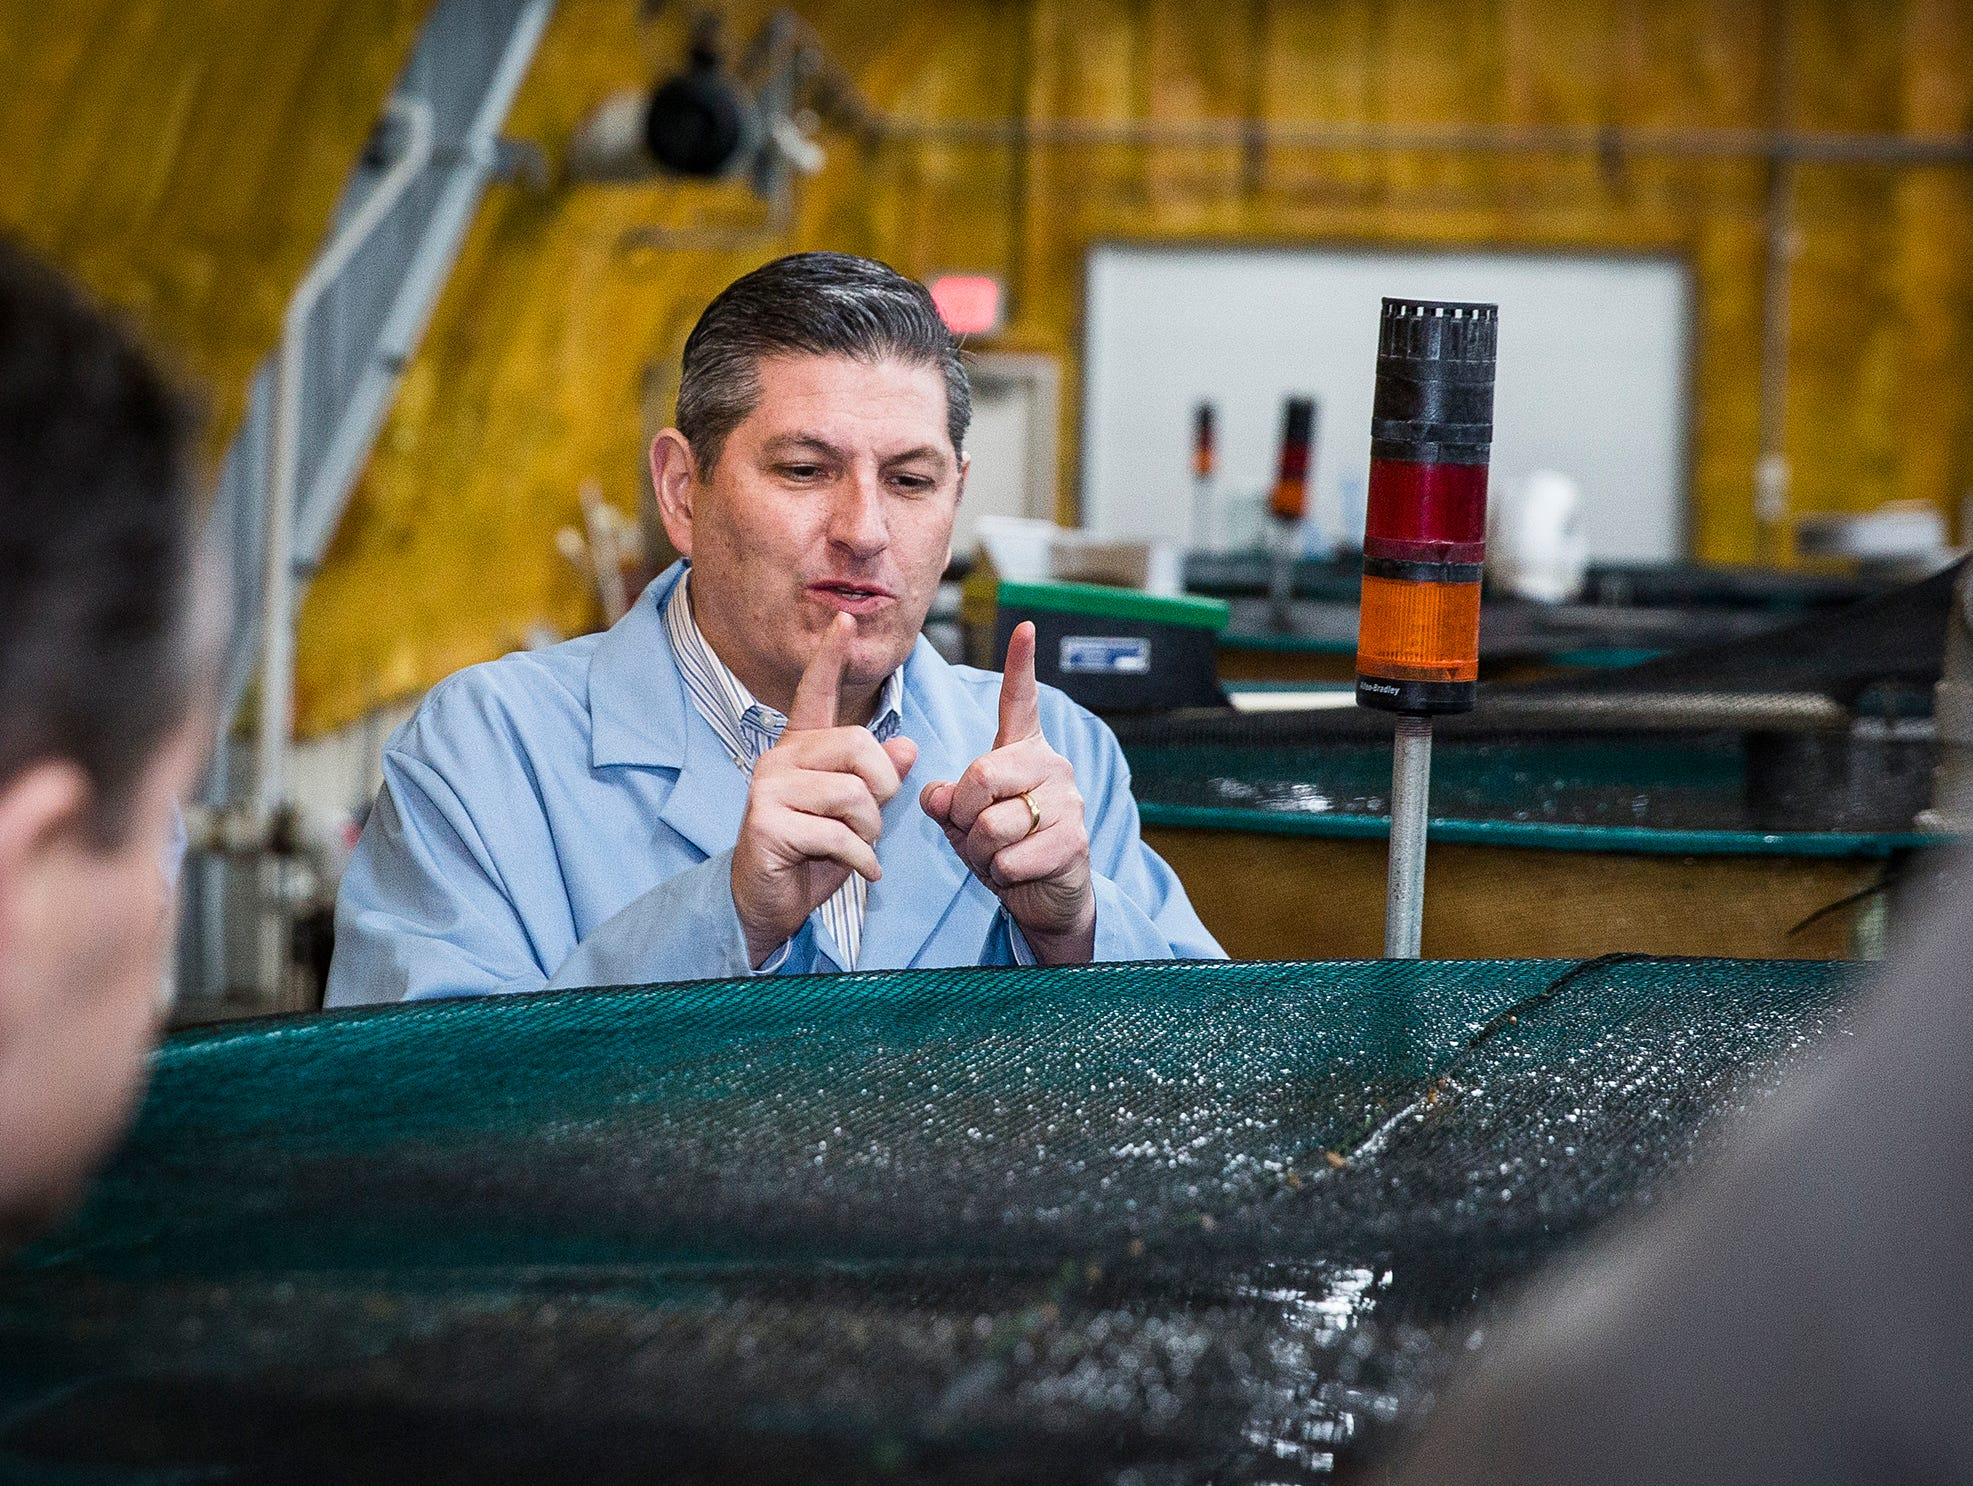 Intrexon official Bradley Shurdut speaks during a tour of the AquaBounty salmon farm.